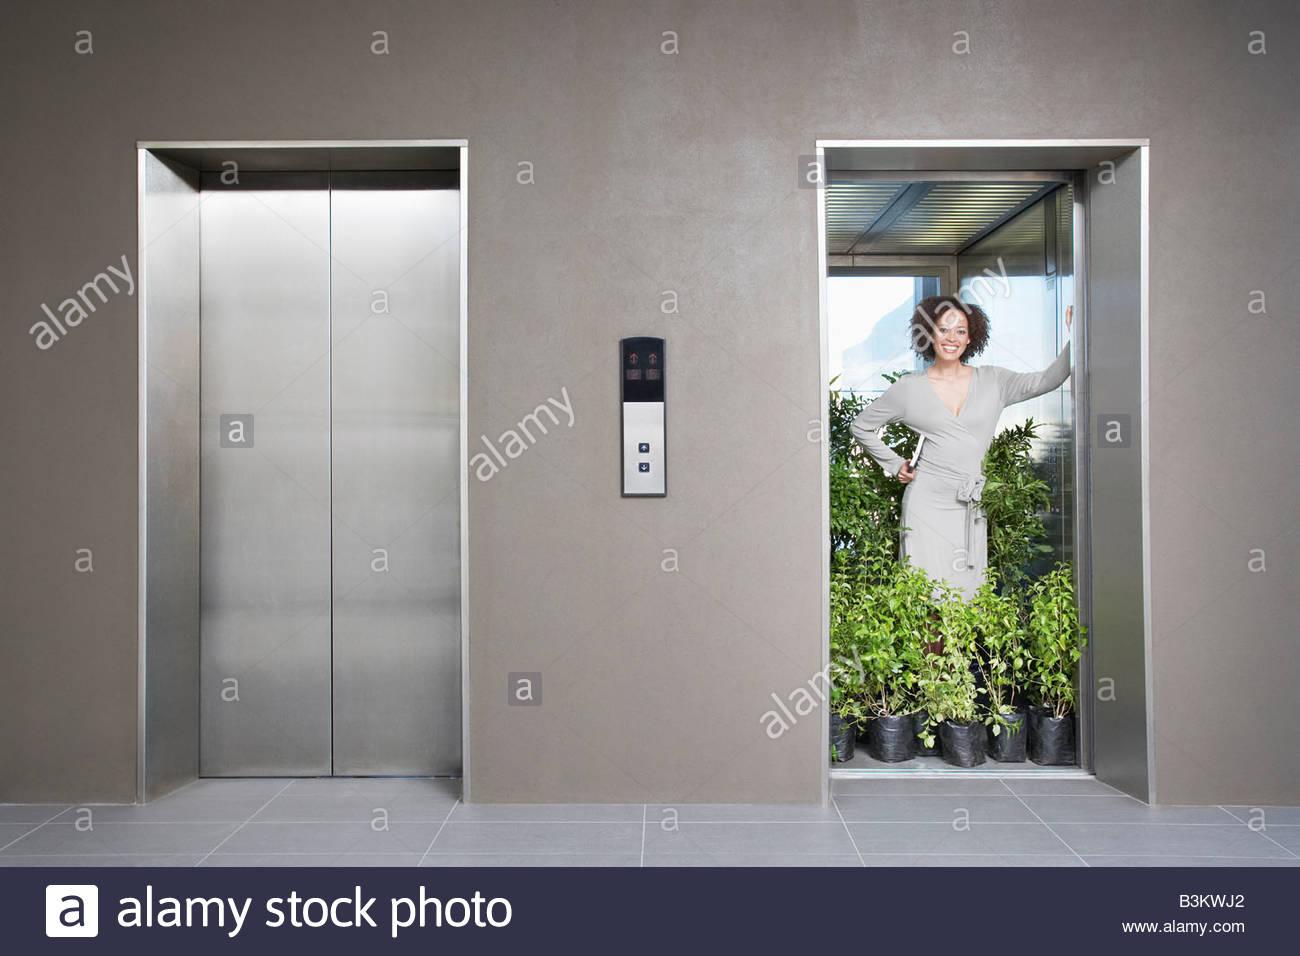 Businesswoman in ascenseur plein de plantes Photo Stock